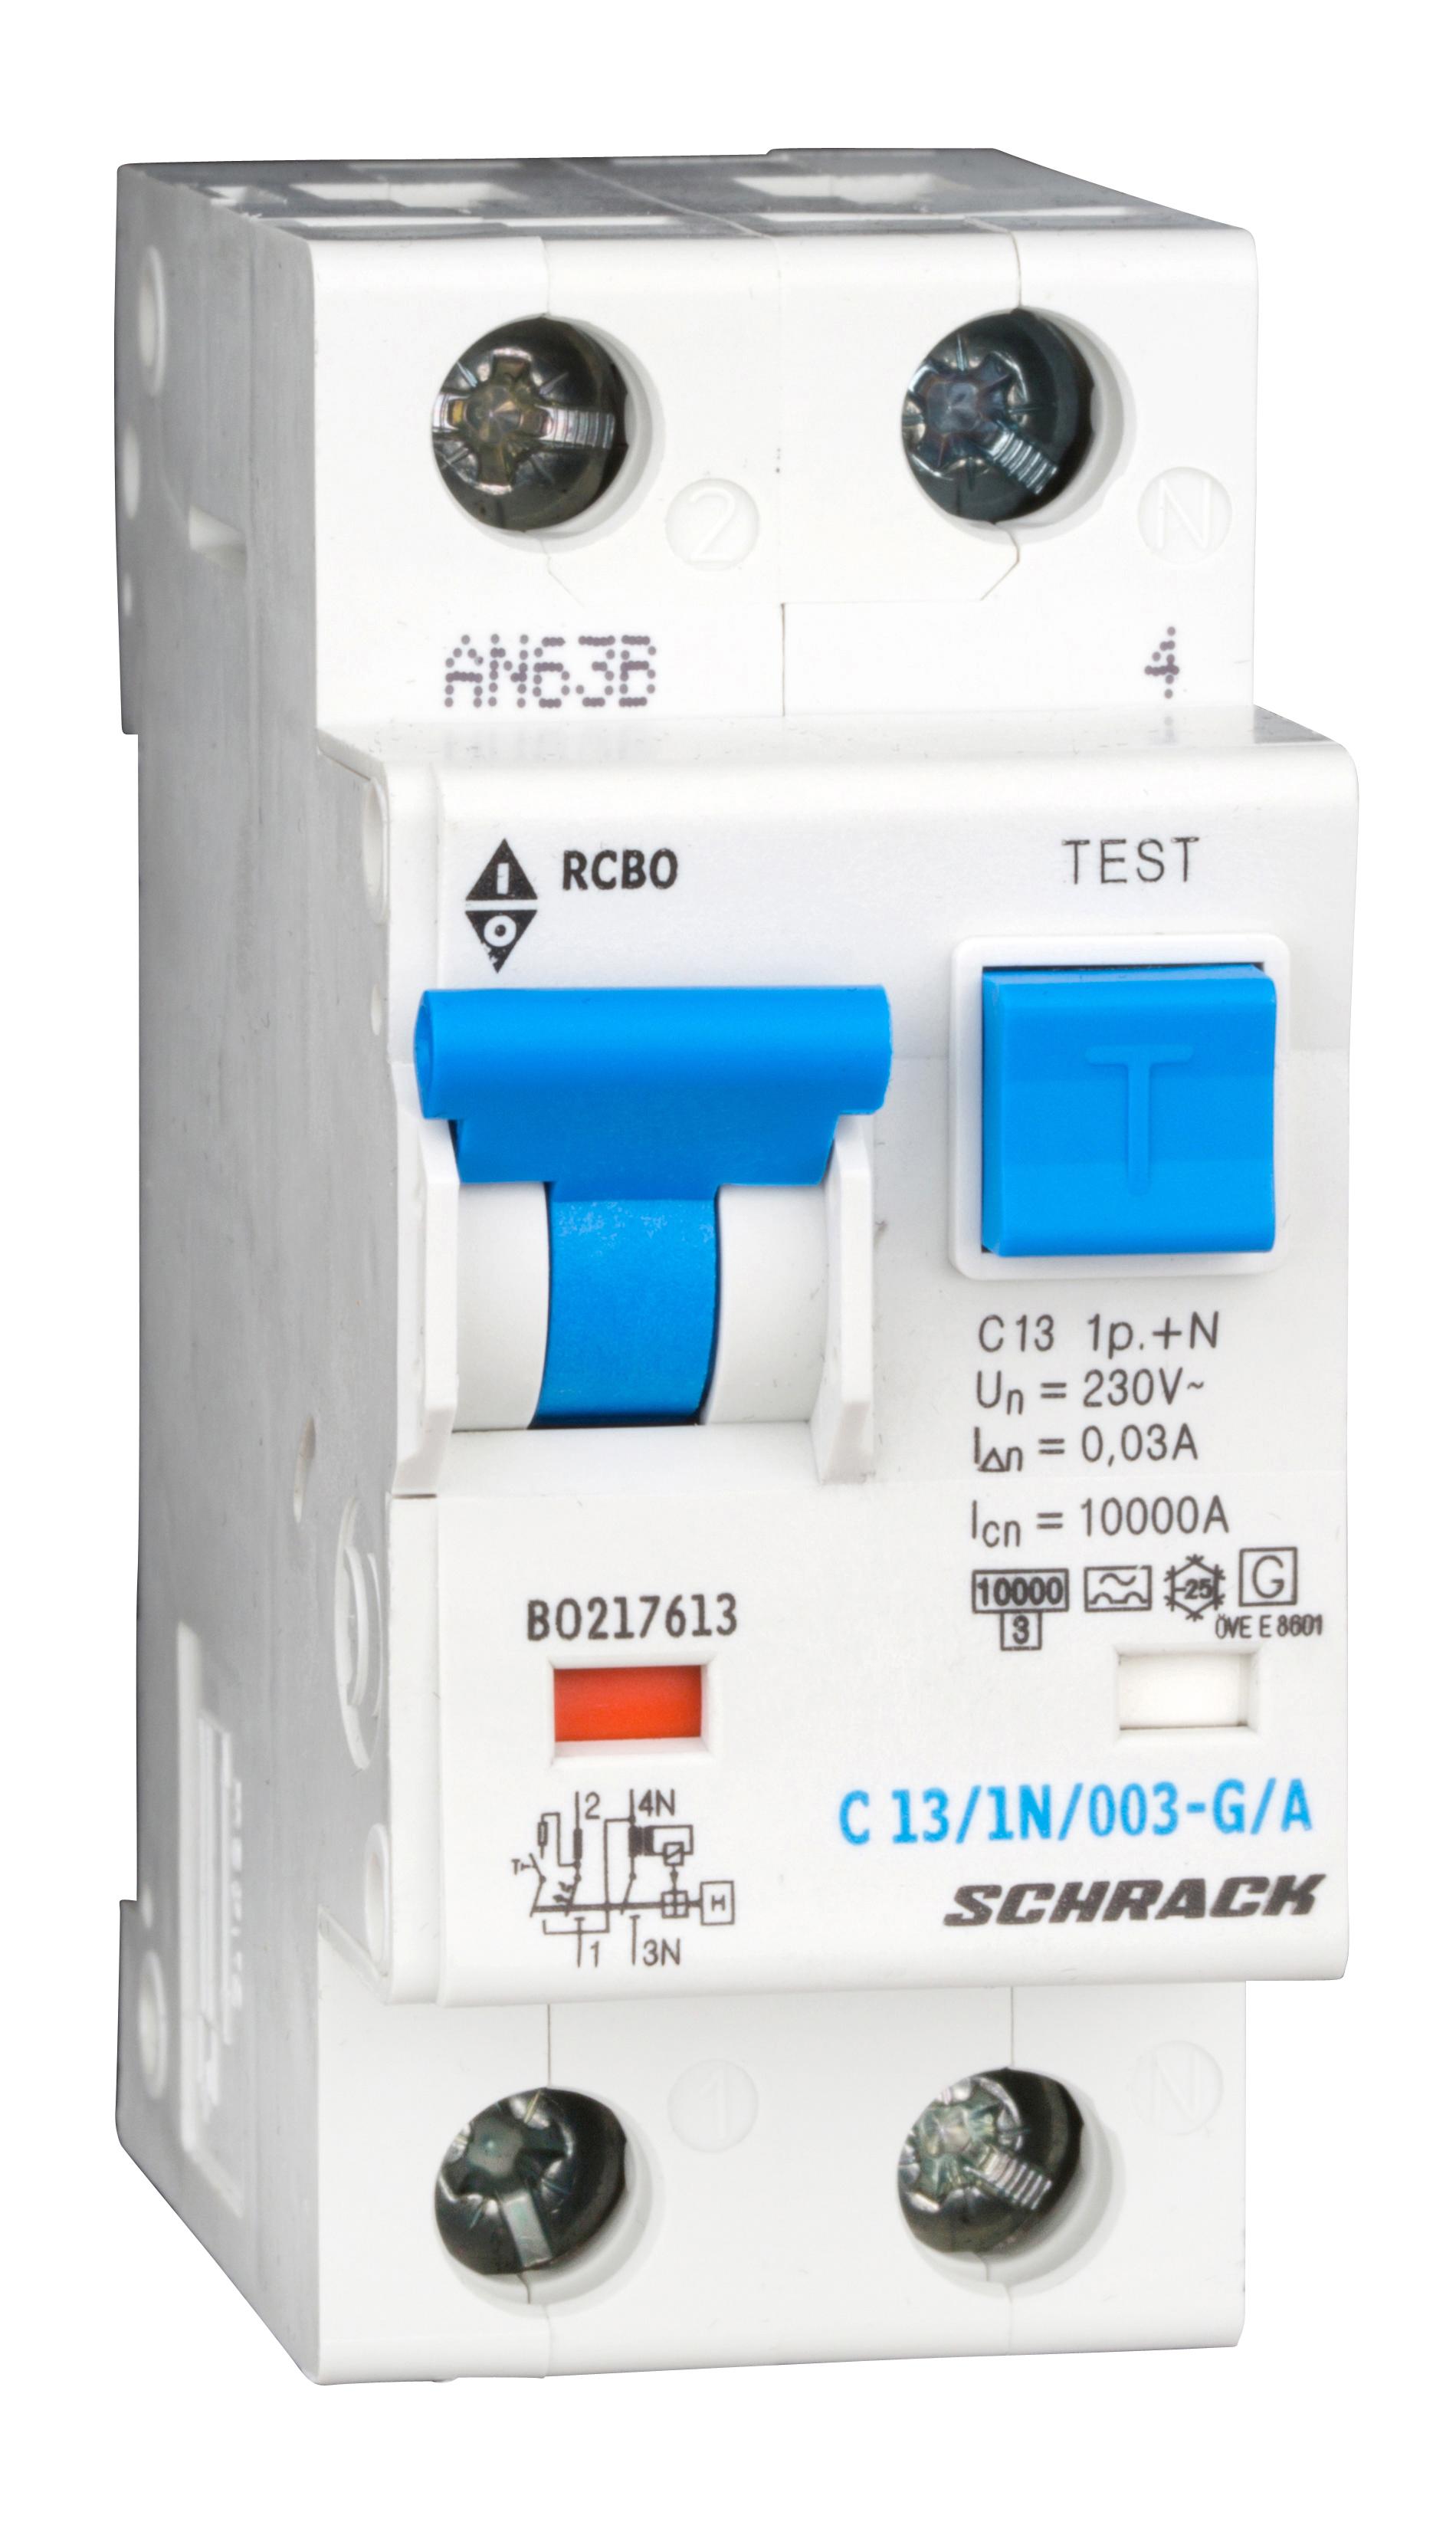 1 Stk LS-FI-Schalter,Kennl. C,13A,30mA,1-polig+N, Bauart G,Typ A BO217613--